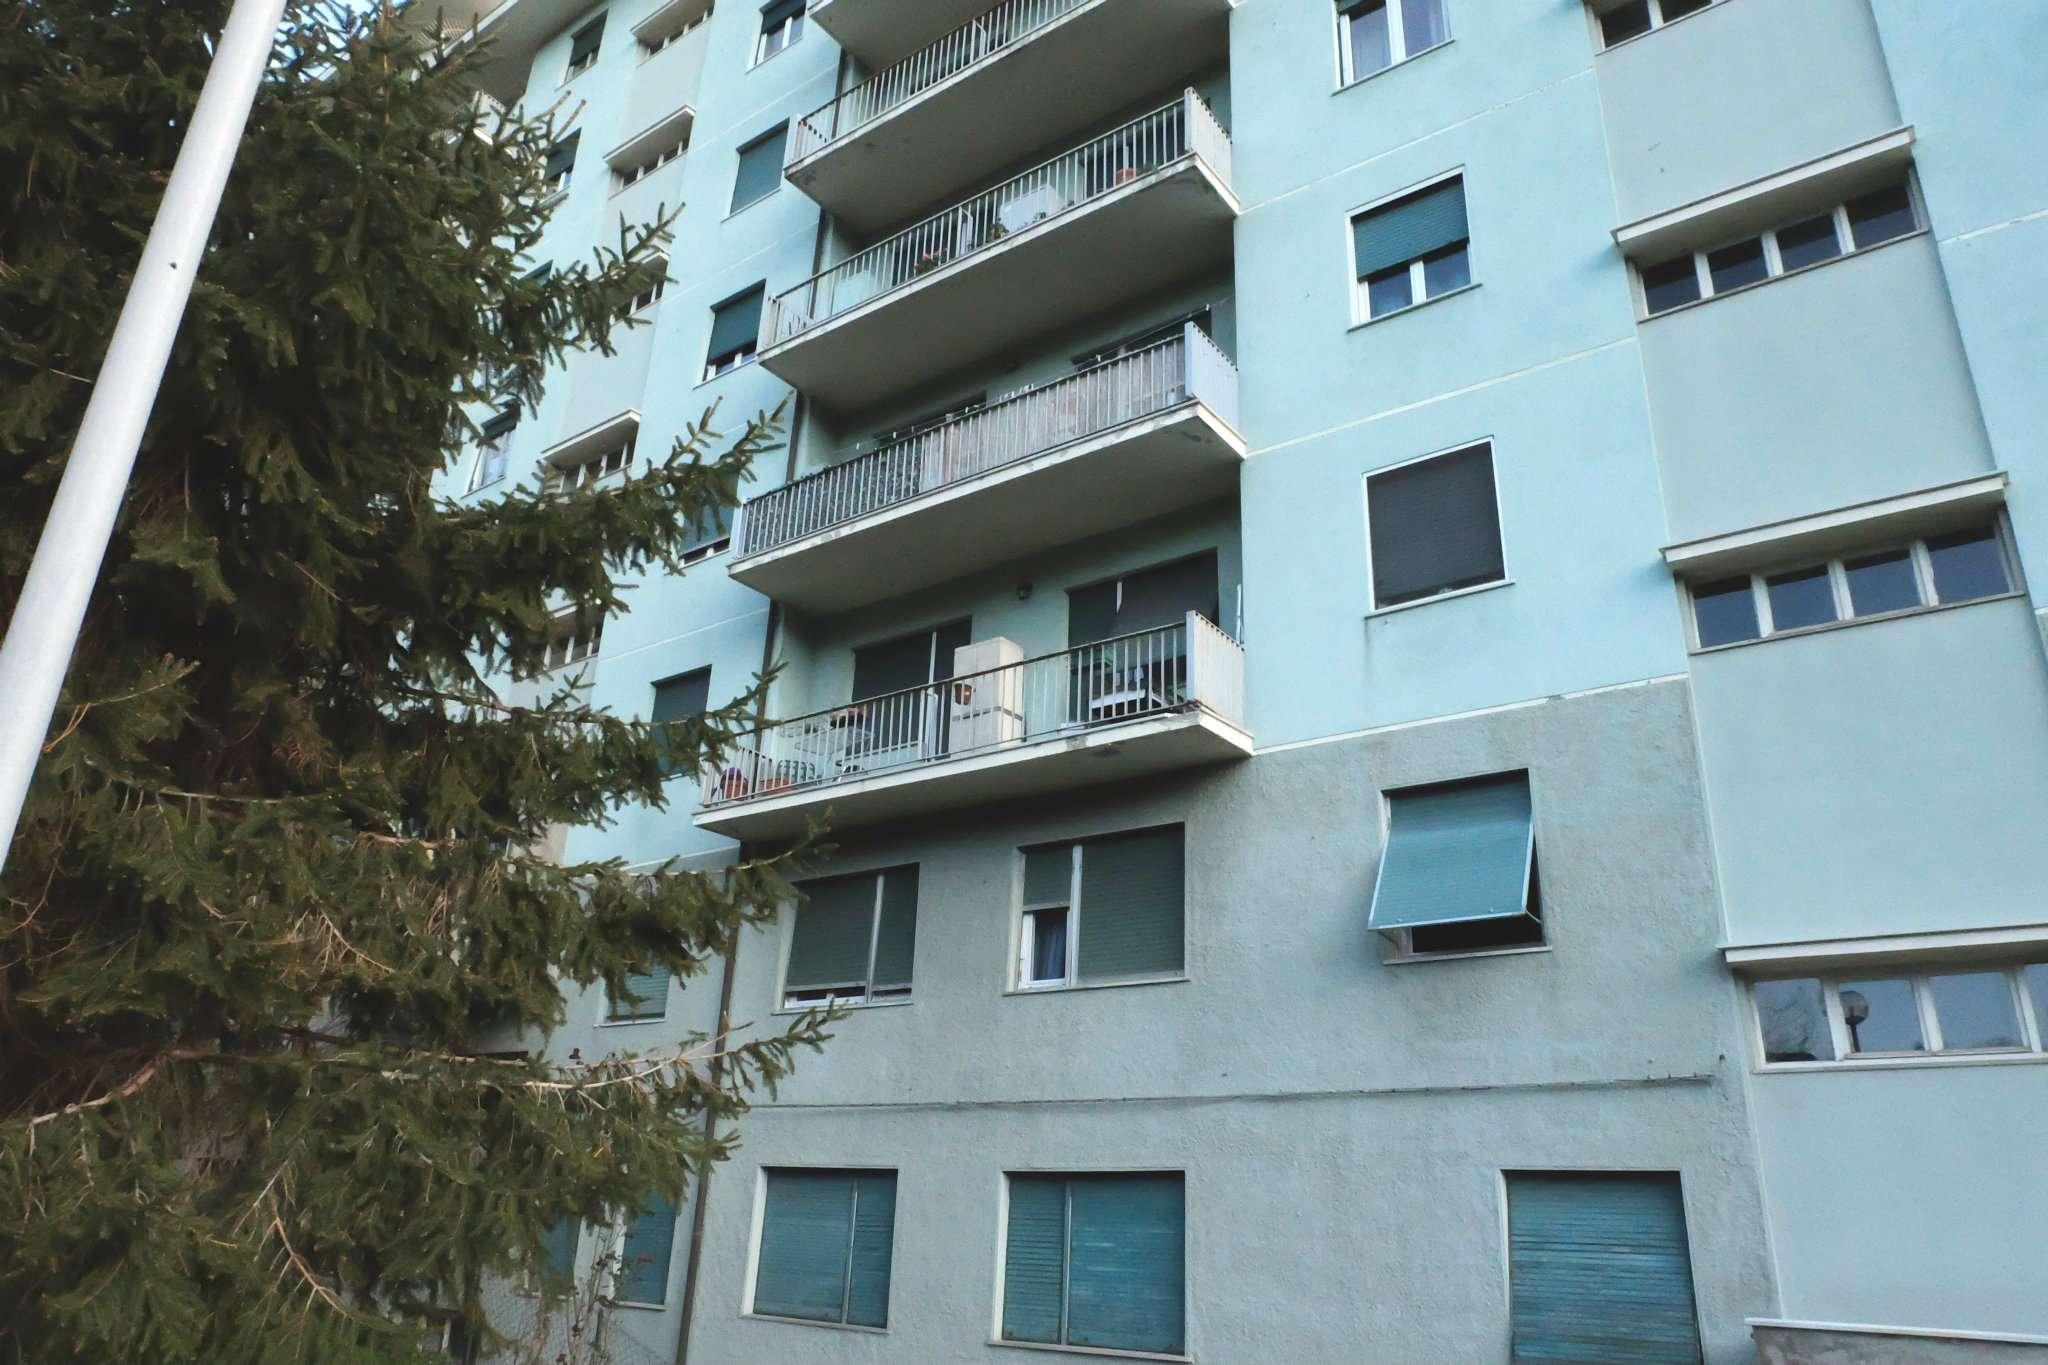 Foto 1 di Appartamento Via Coronata, Genova (zona Coronata-Fegino)